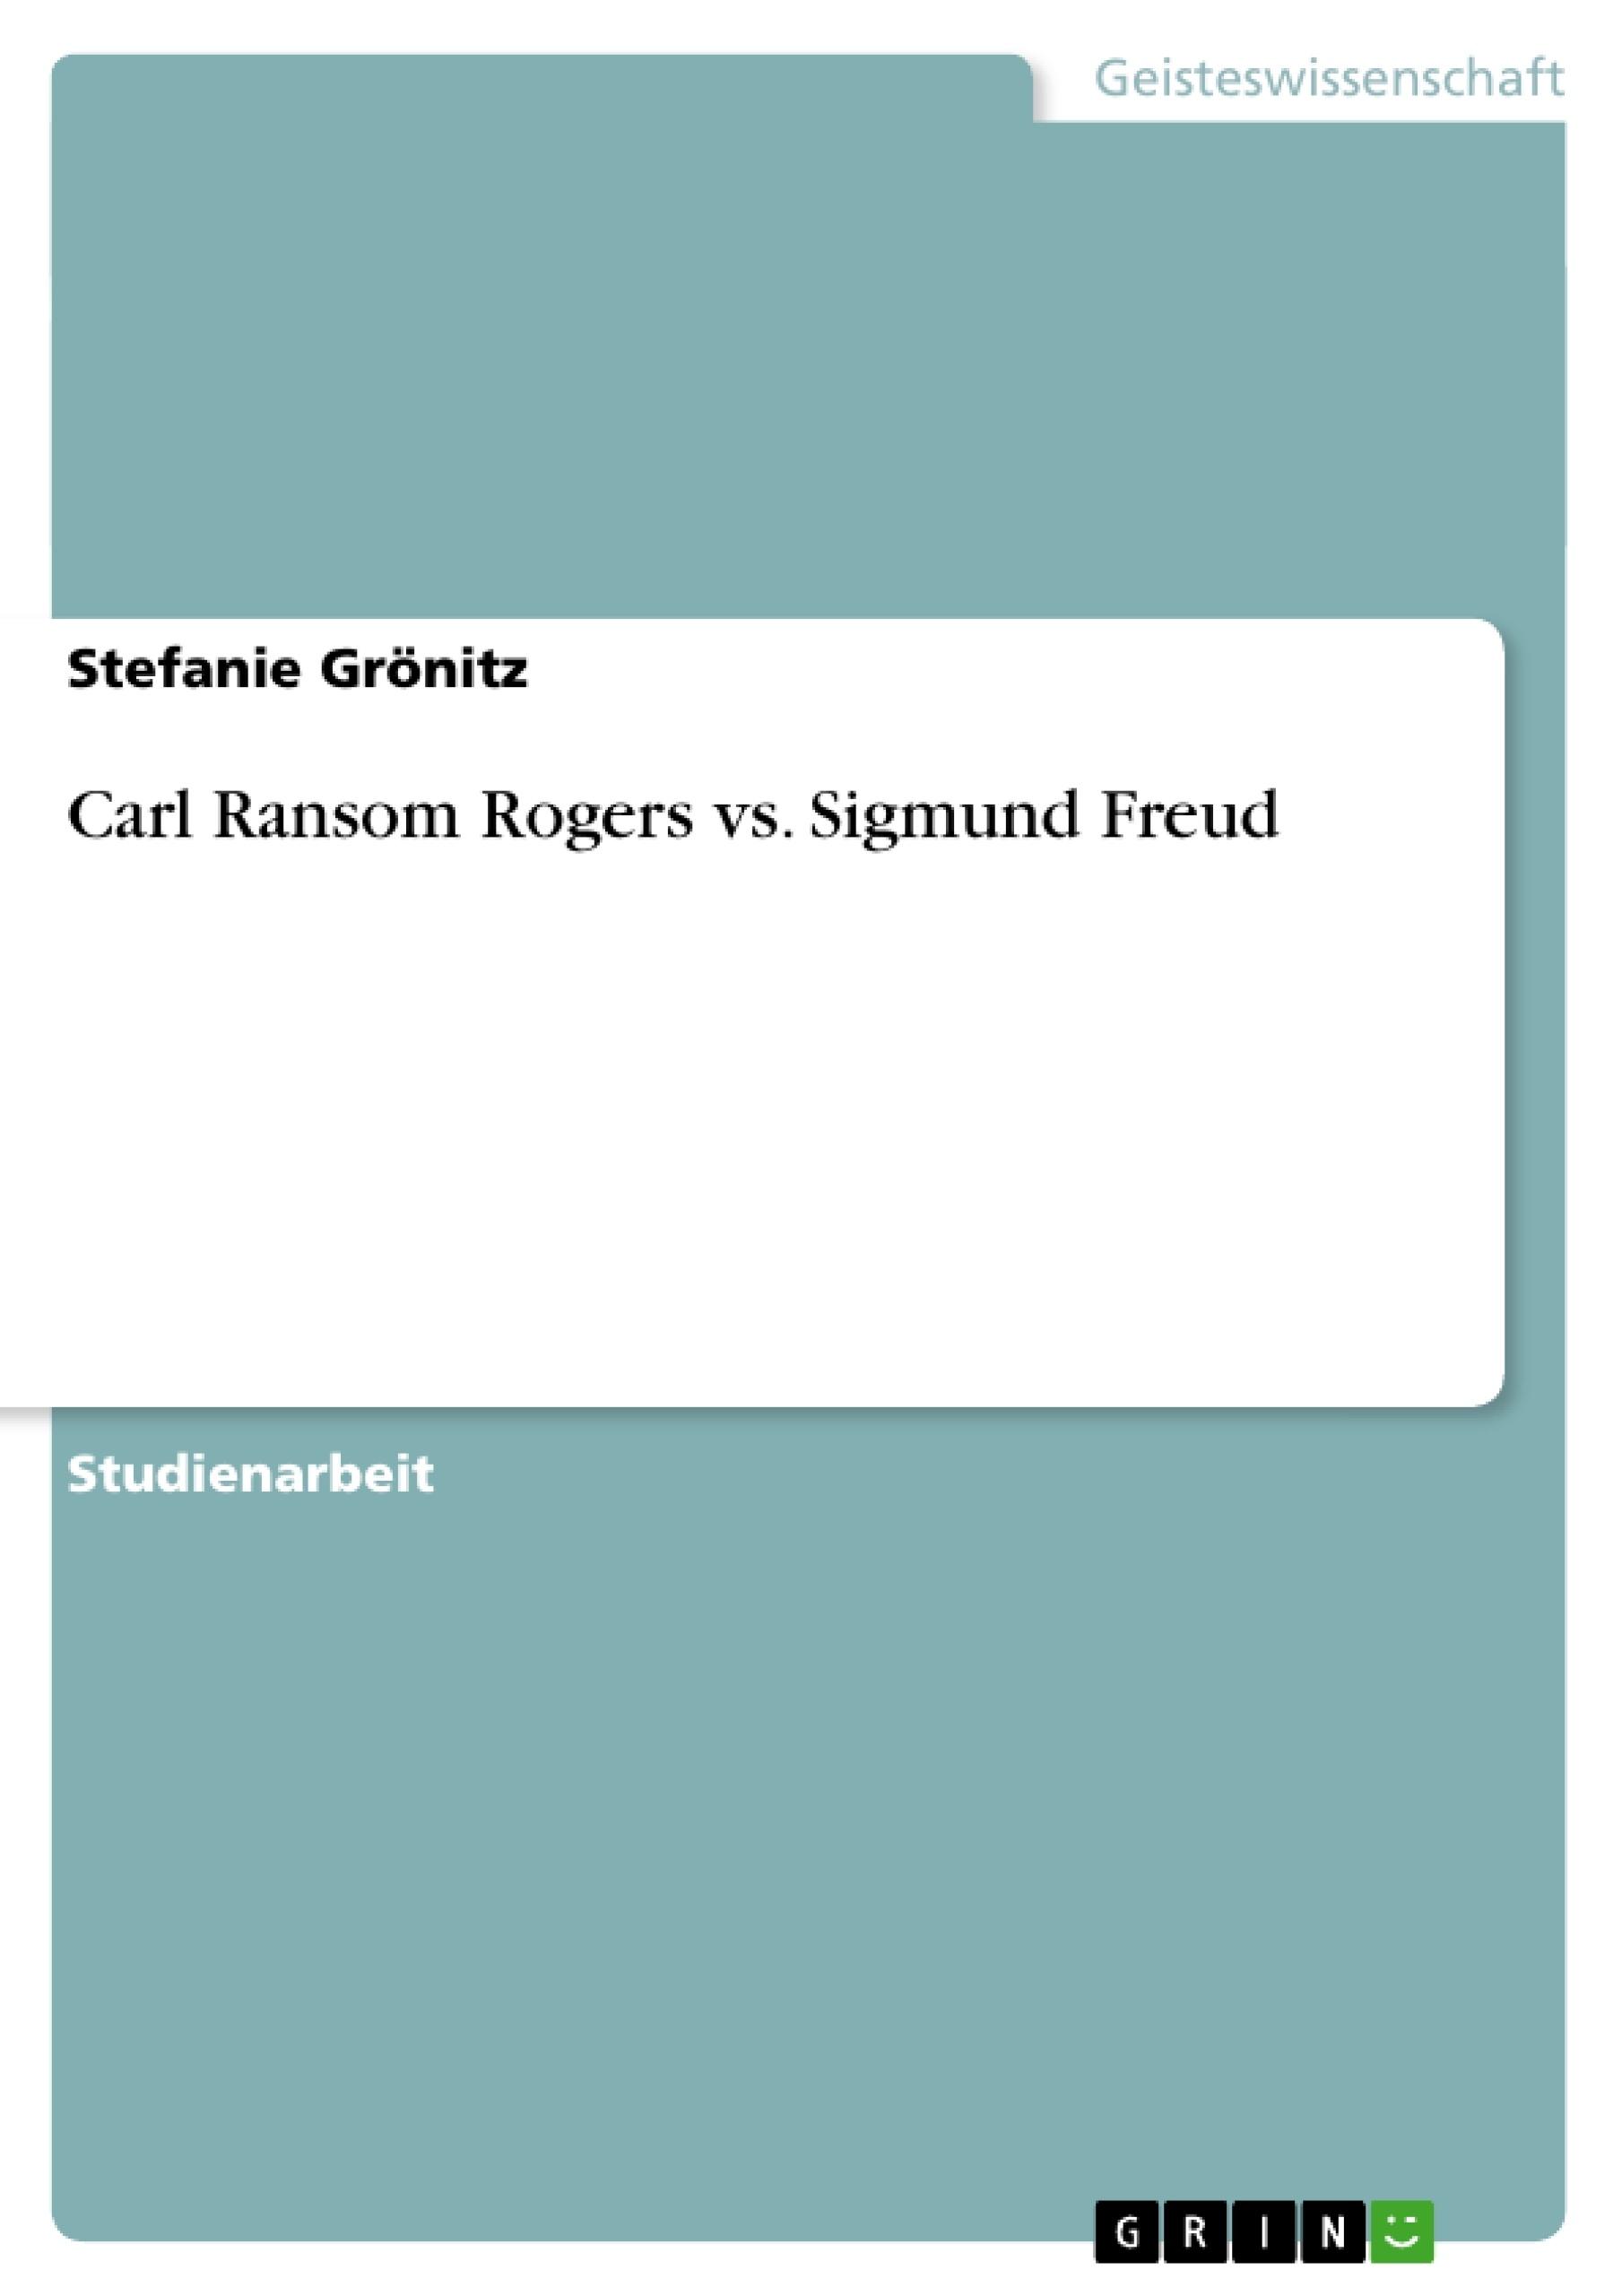 Titel: Carl Ransom Rogers vs. Sigmund Freud